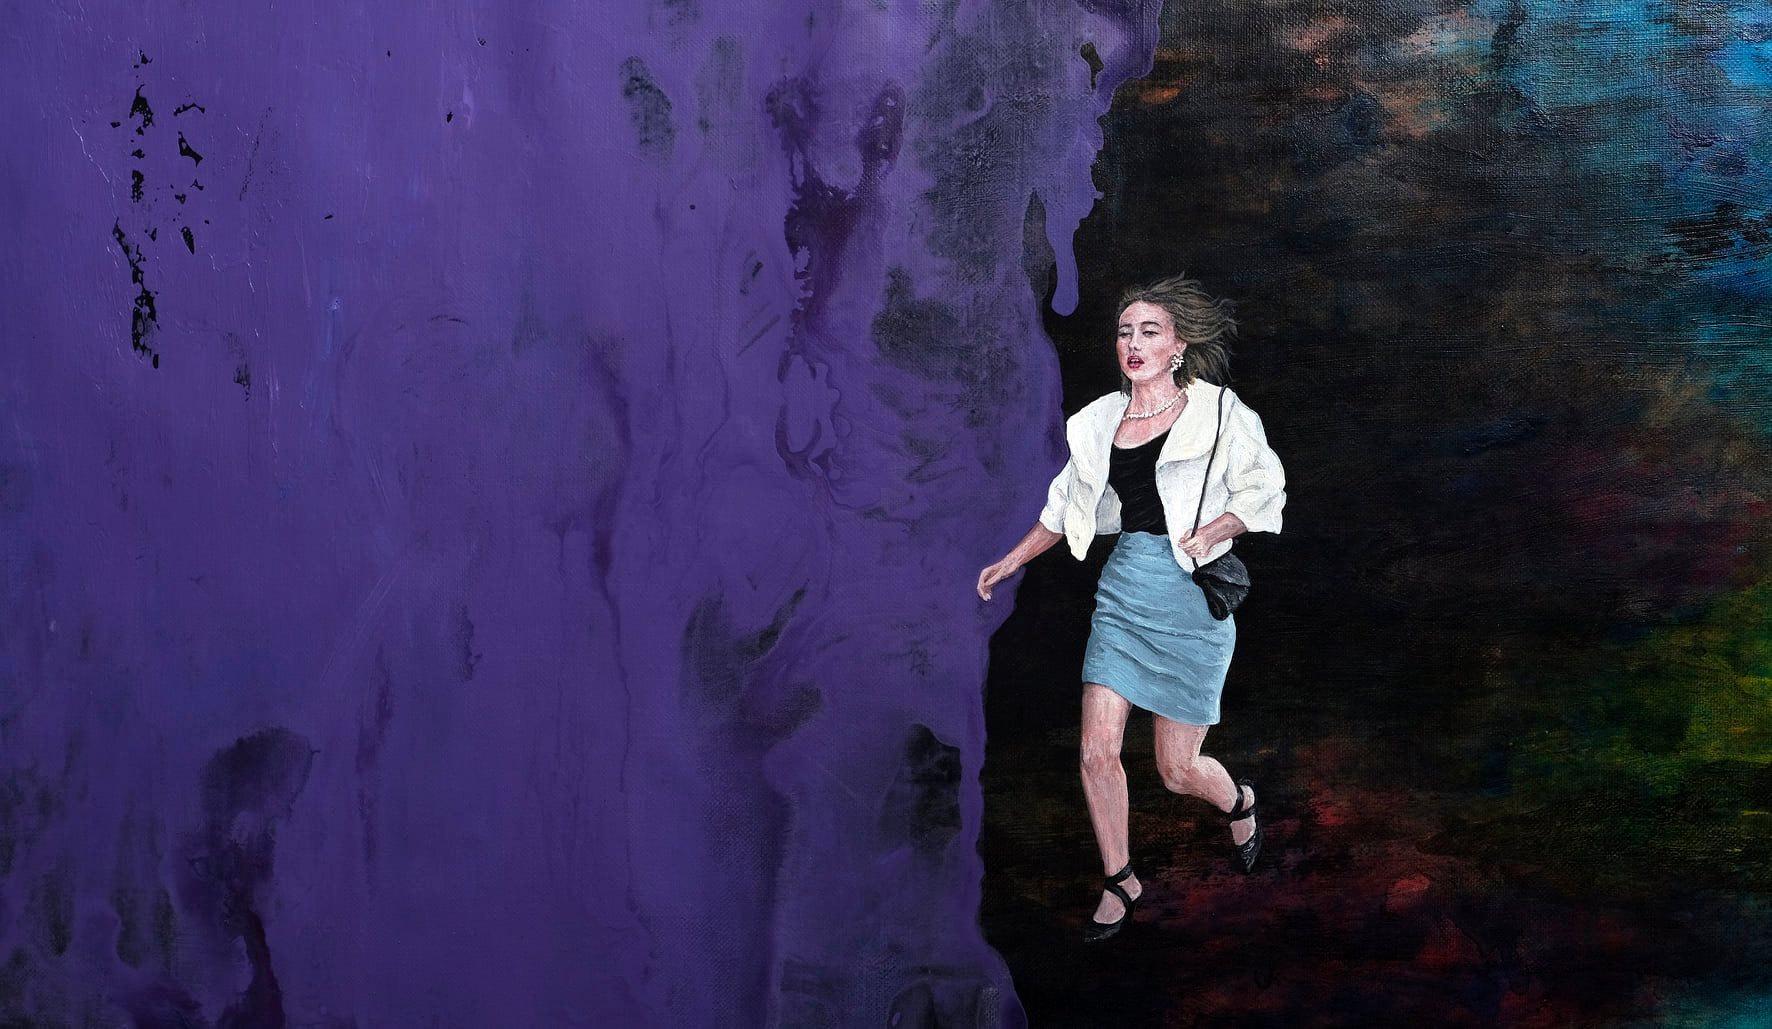 Vista obra de Camila Valenzuela von Appen. Pintura sobre lino. Varsovia, noviembre de 2020 © 2020.